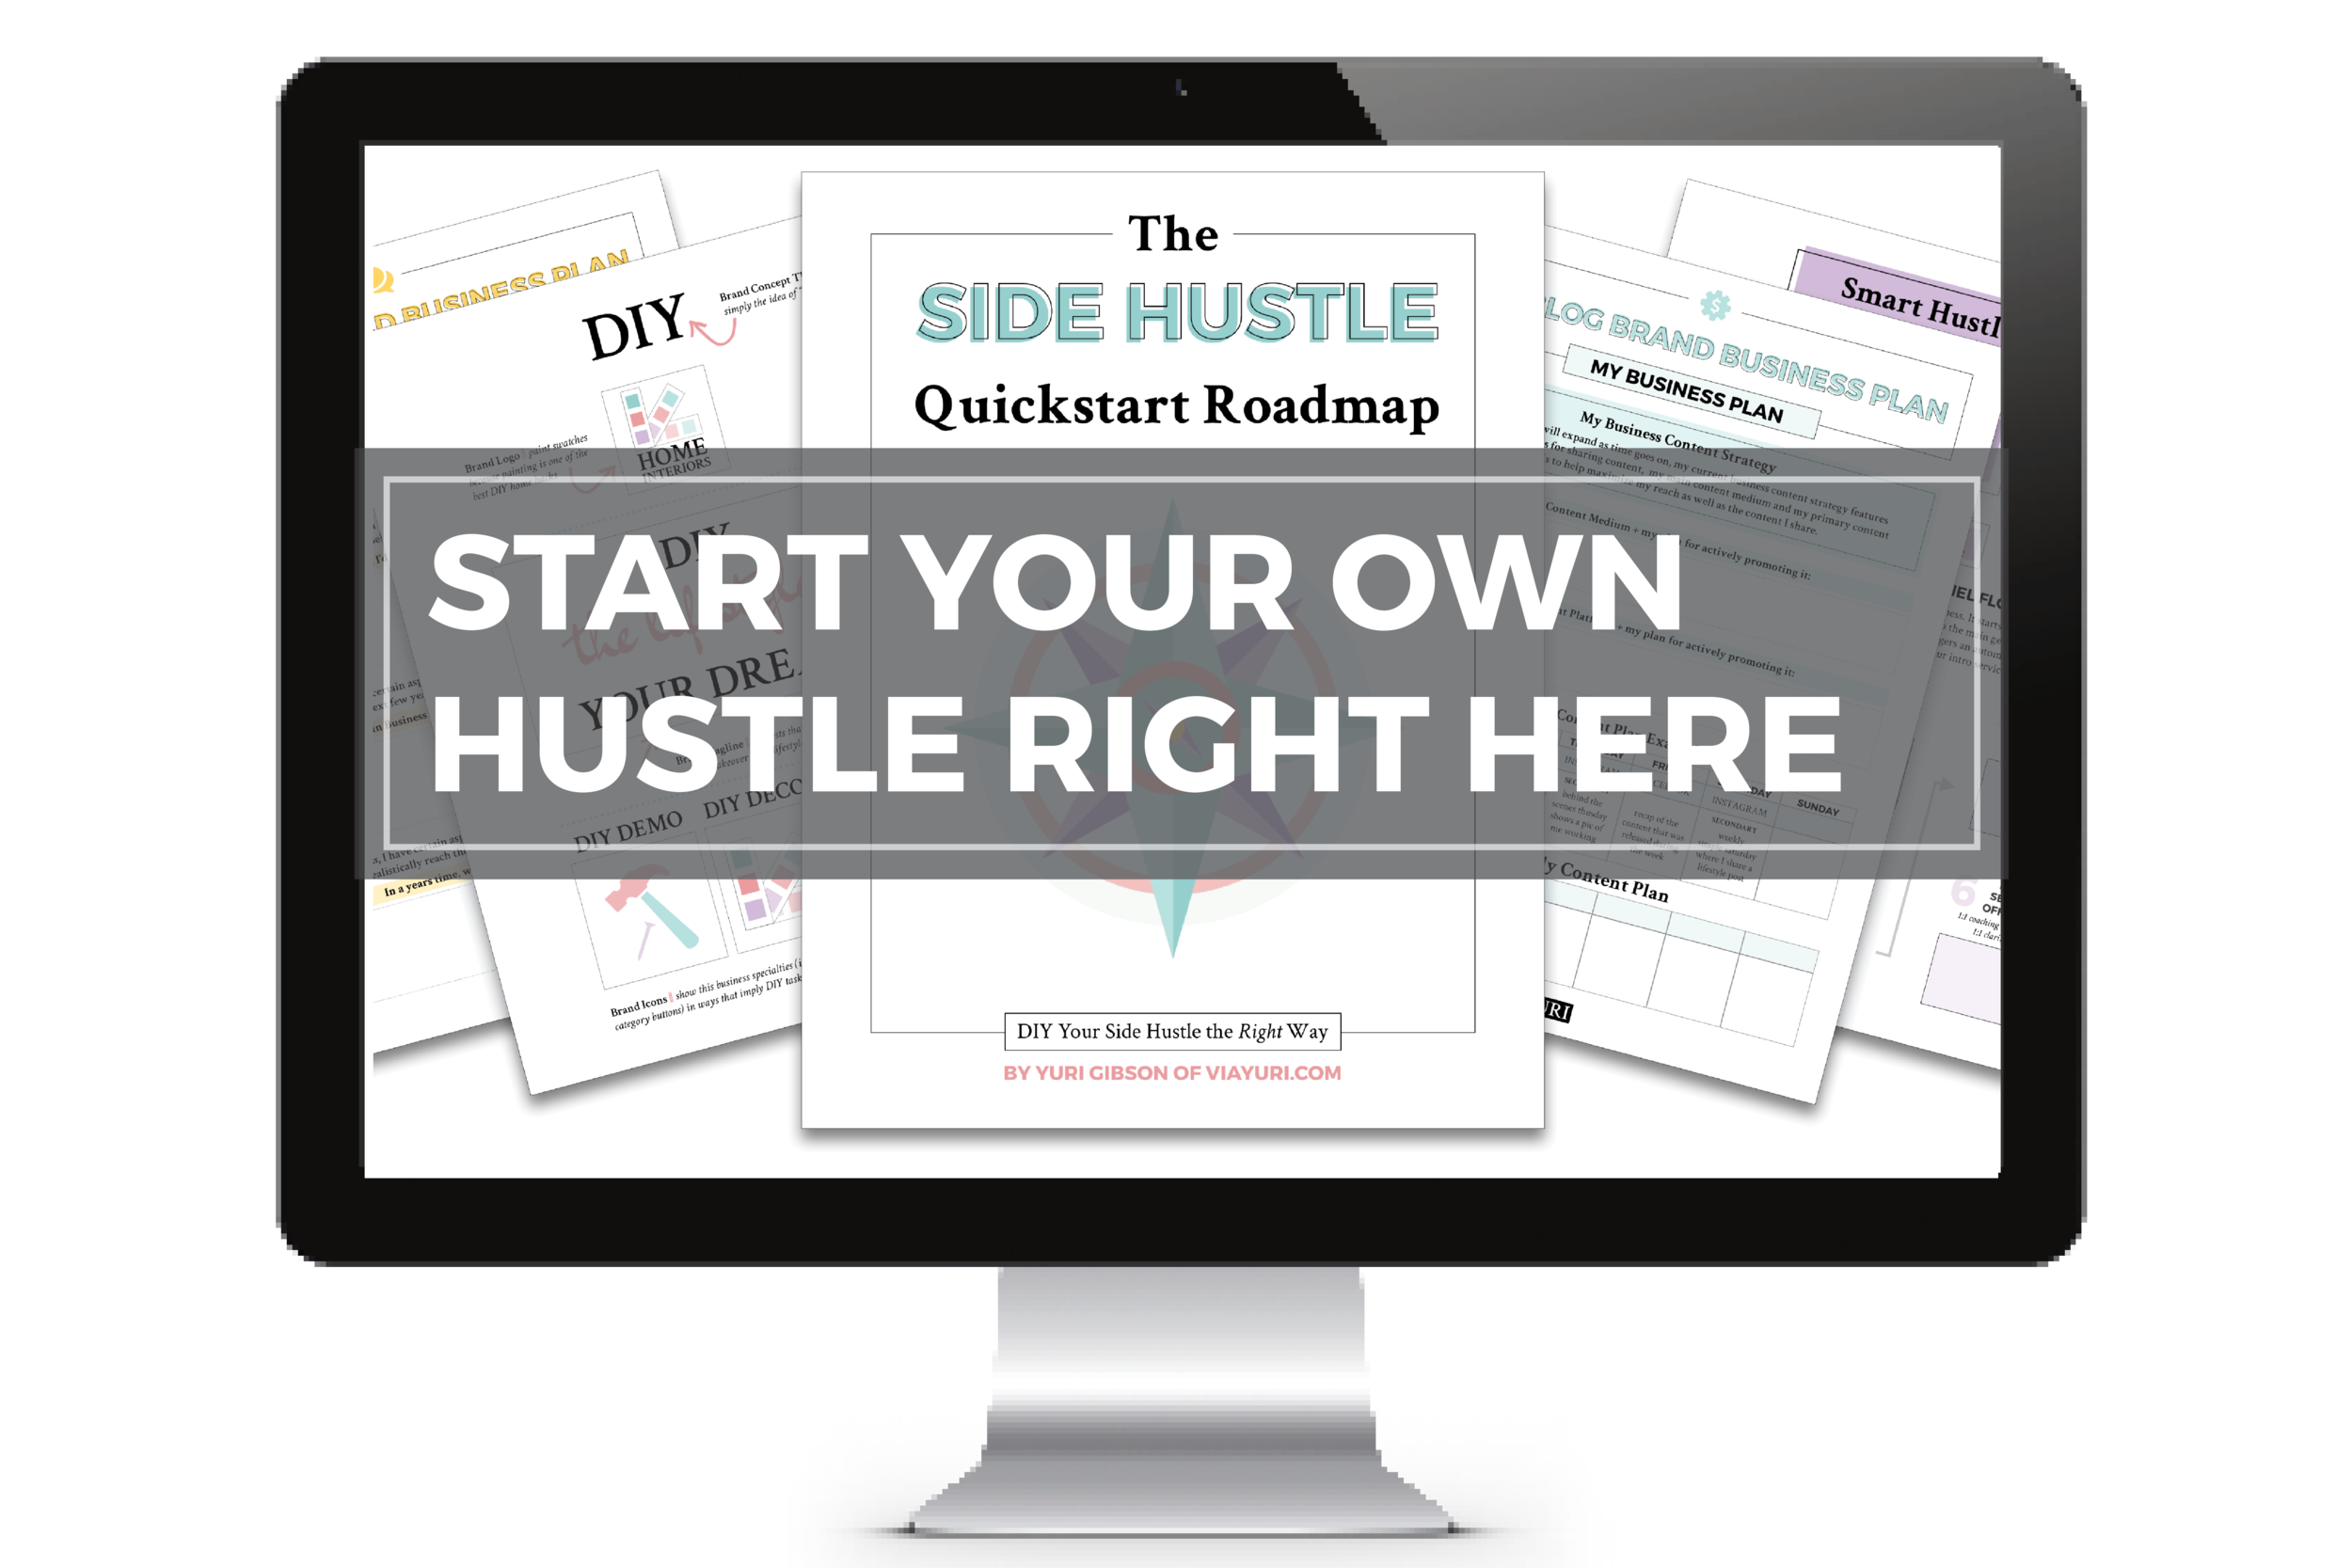 The Side Hustle Quickstart Roadmap  || by Yuri Gibson of viaYuri.com > Earn More, Spend Less, Live Better